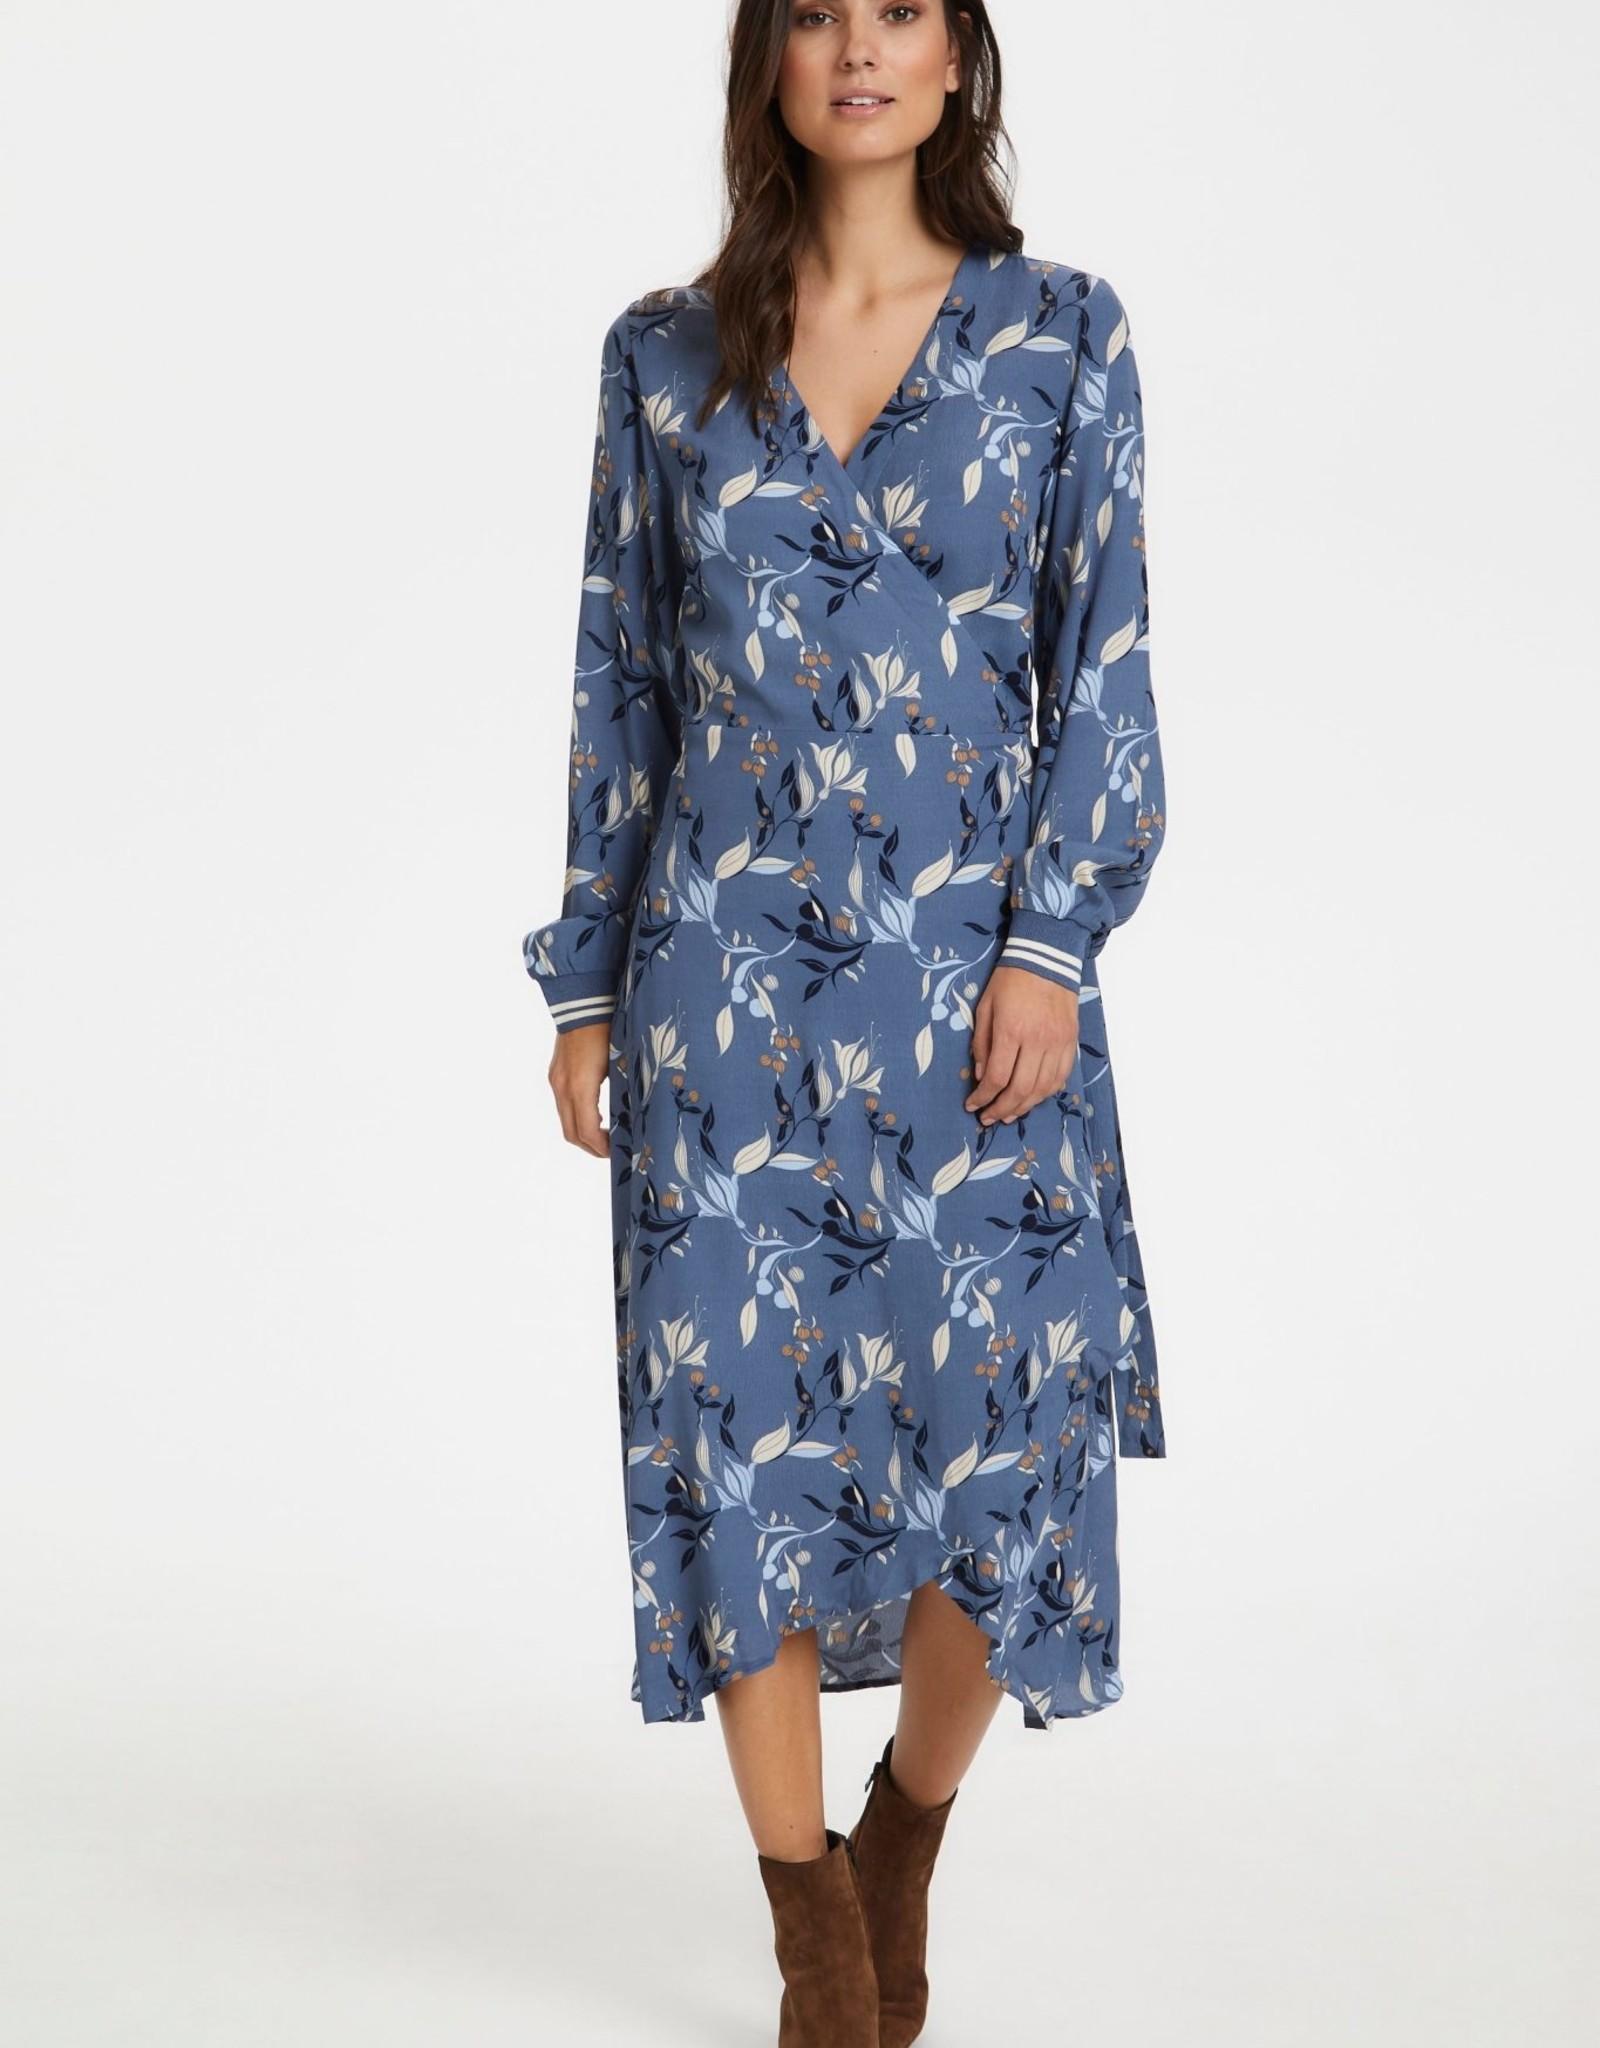 PART TWO The Berbel Dress